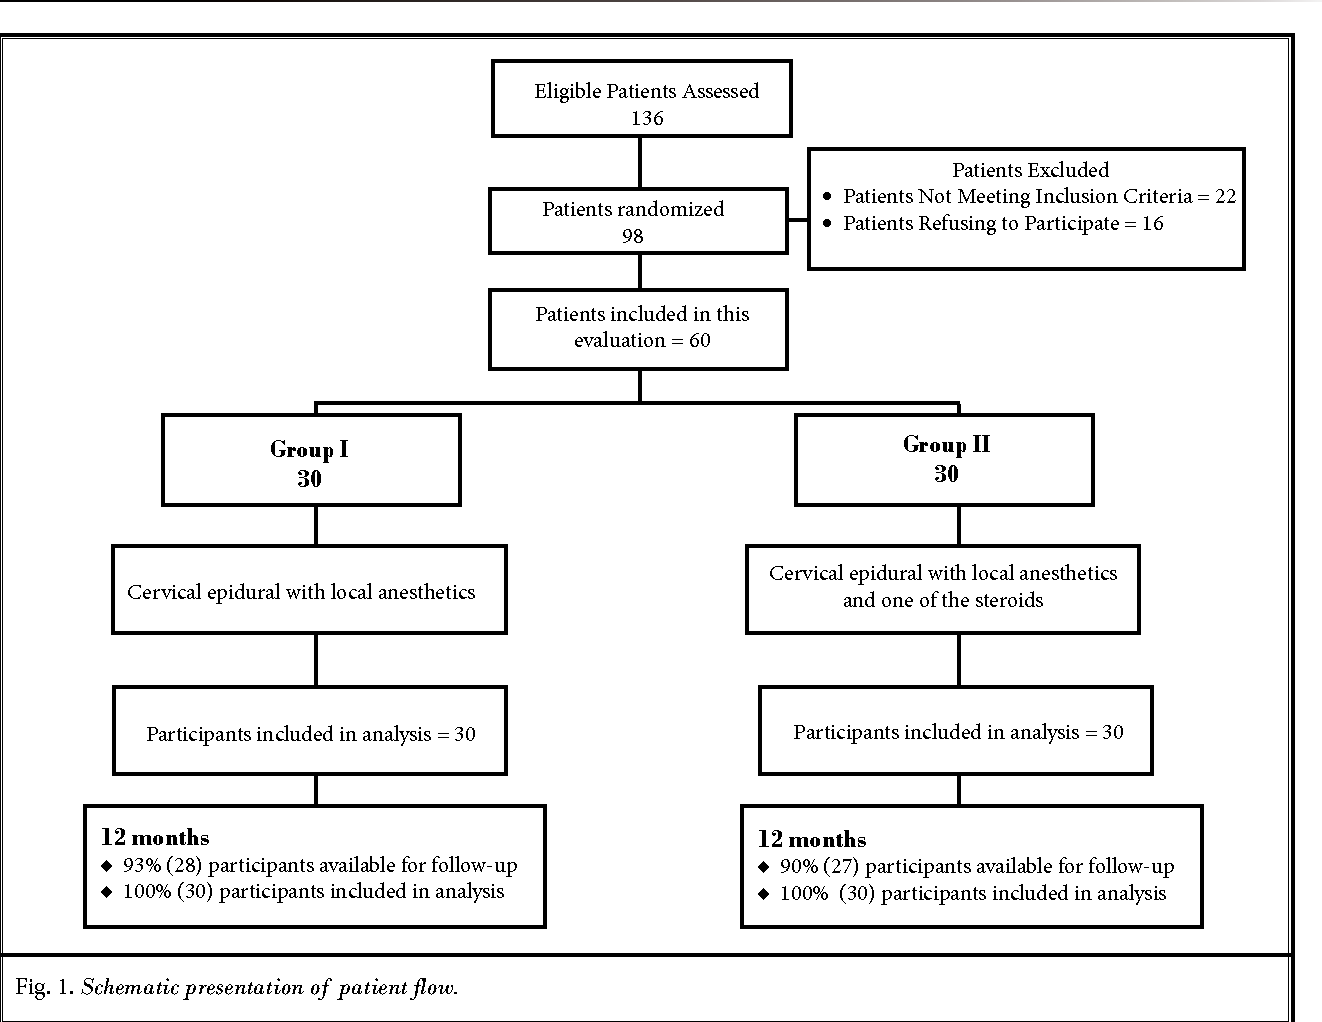 Fig. 1. Schematic presentation of patient flow.